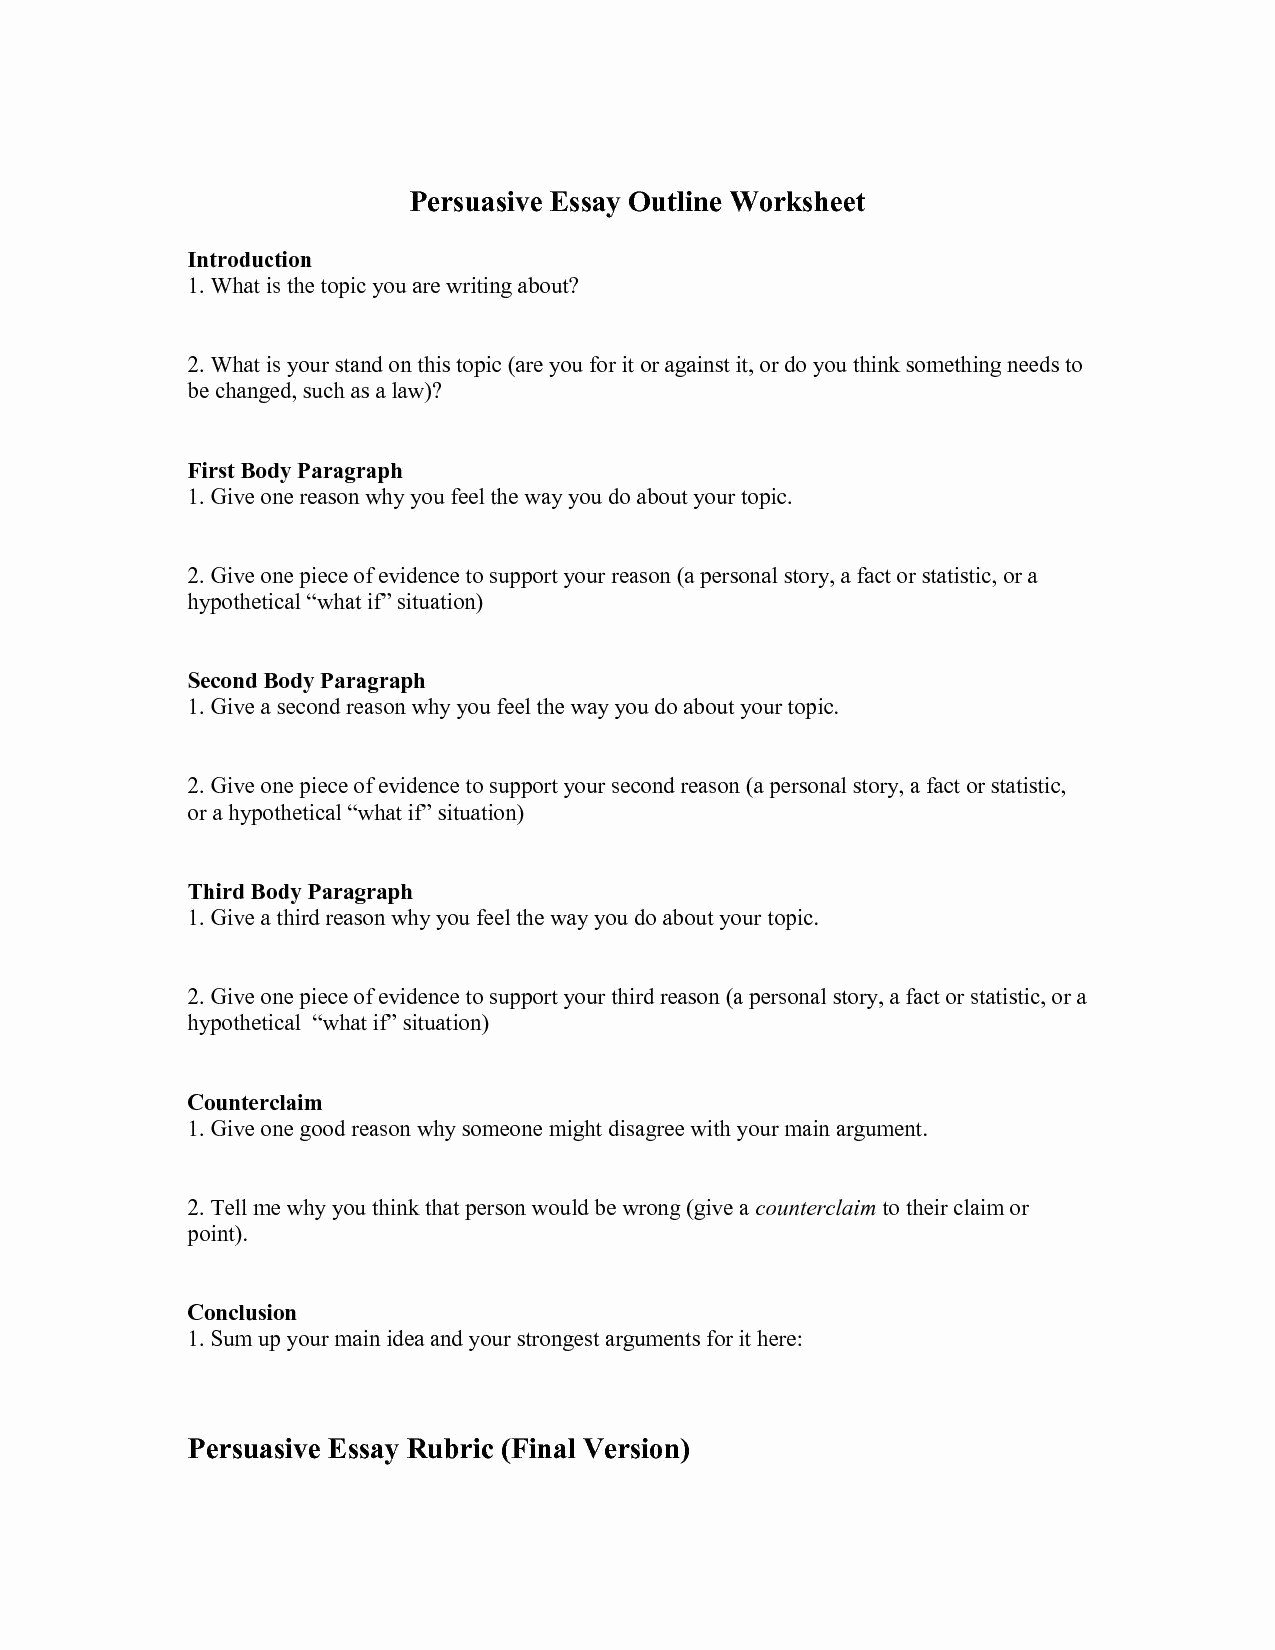 Logical Fallacies Worksheets High School Lovely Logical Fallacies Worksheet High School Logical Fallacies